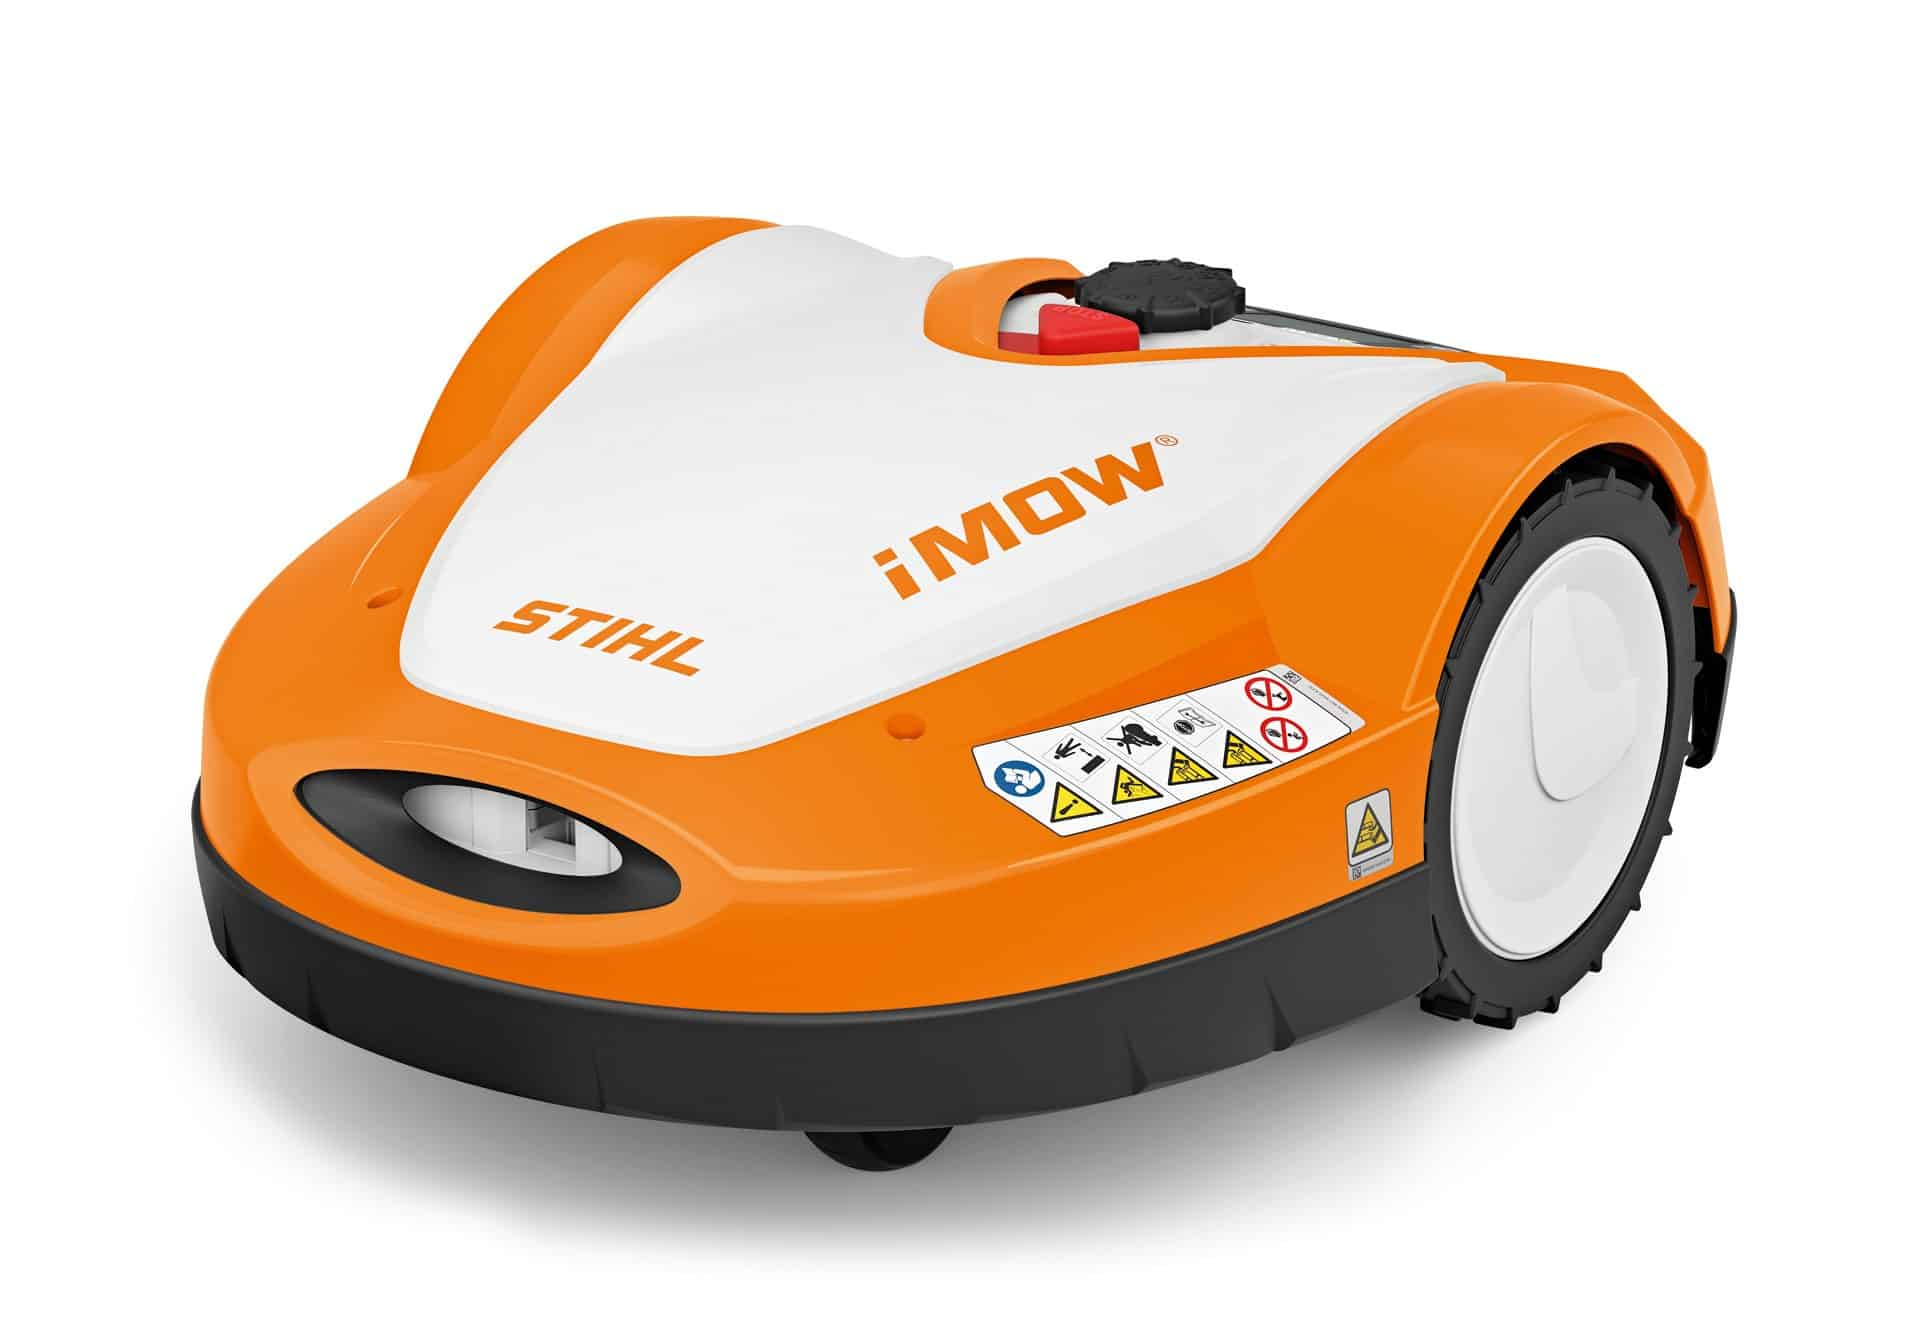 Stihl RMI 632P  iMow Robotic Mower